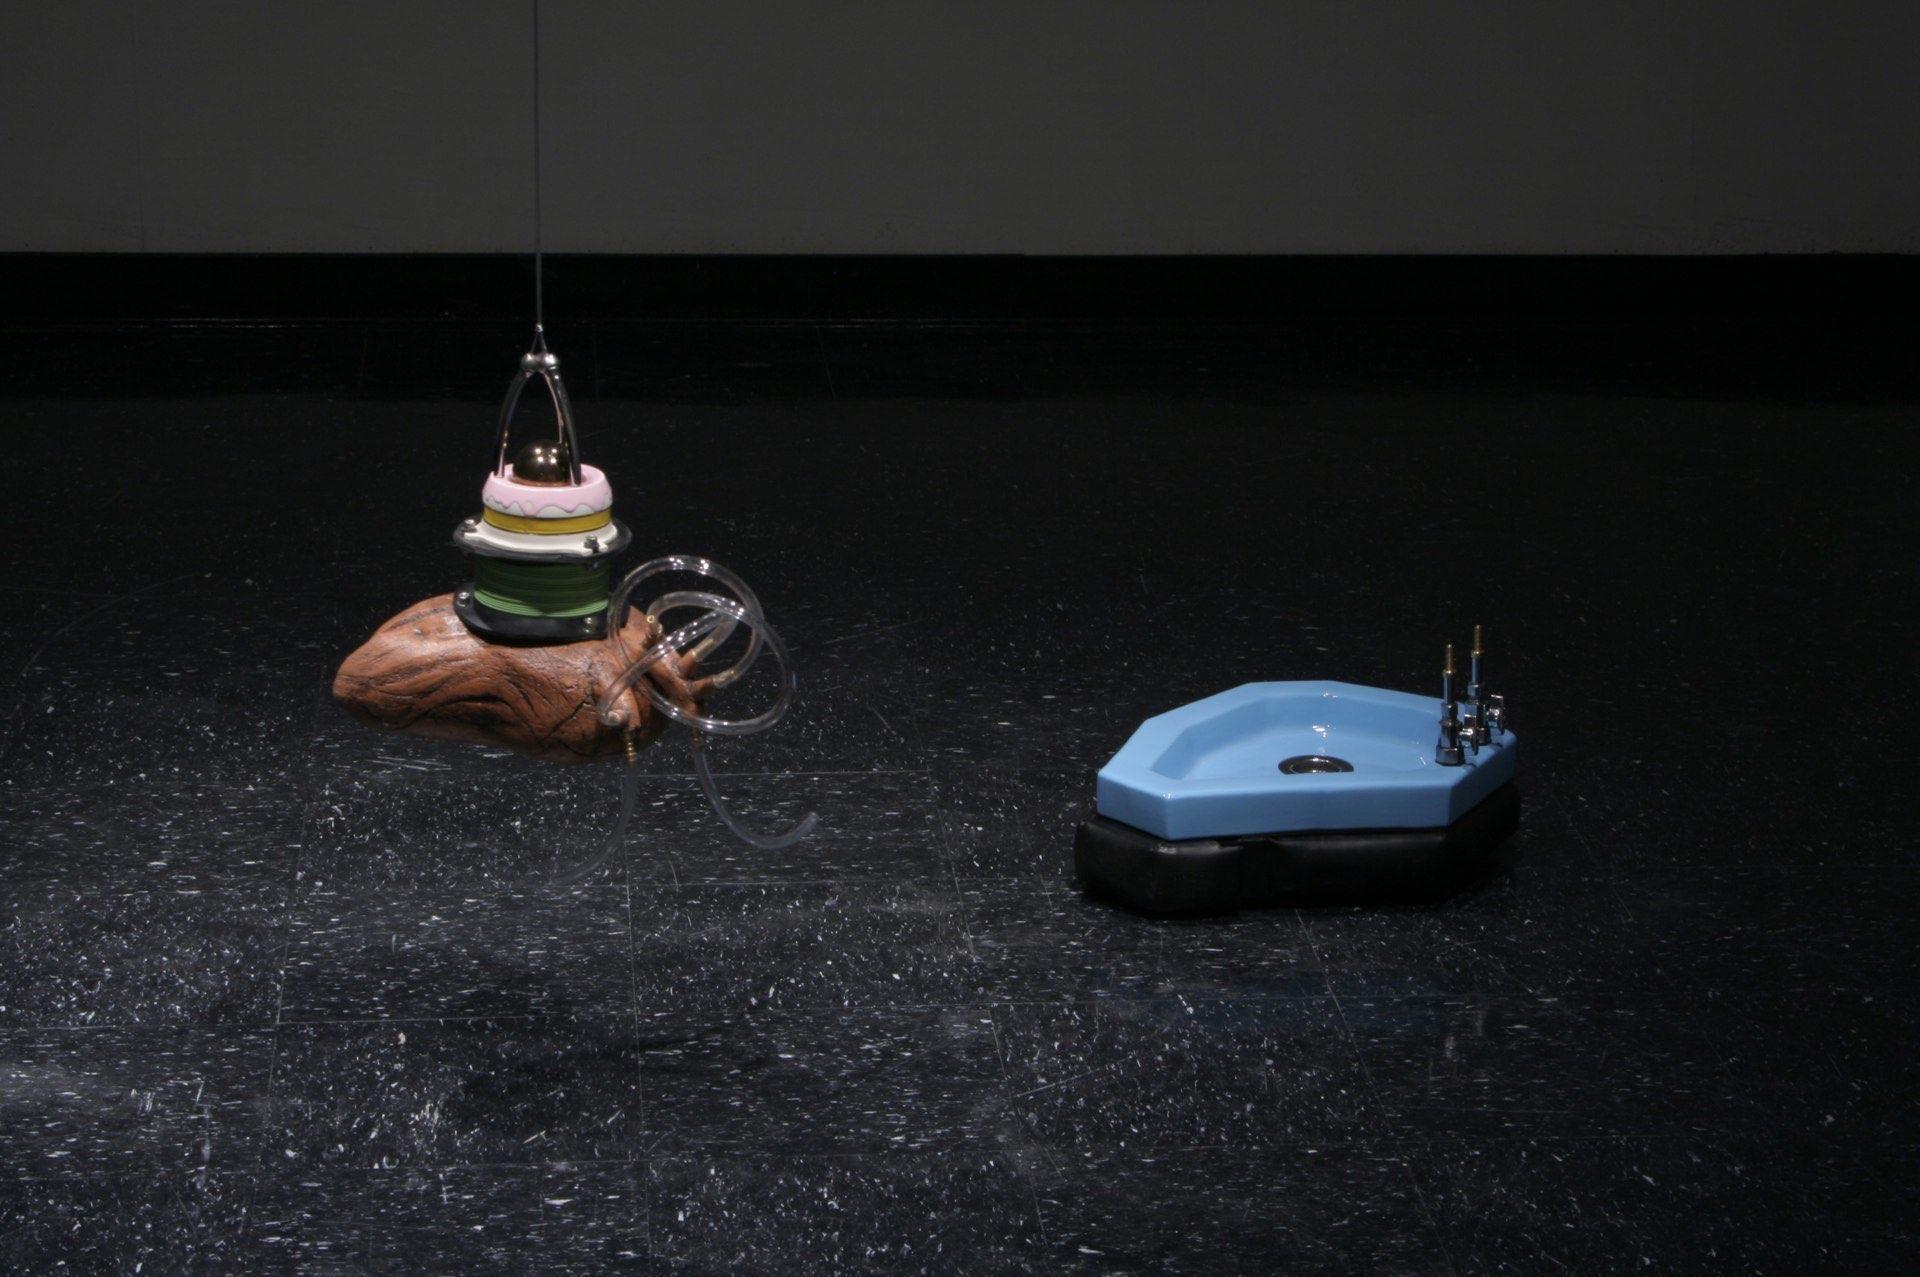 Czibesz 'The Homing Instinct' (installation view 3).jpg